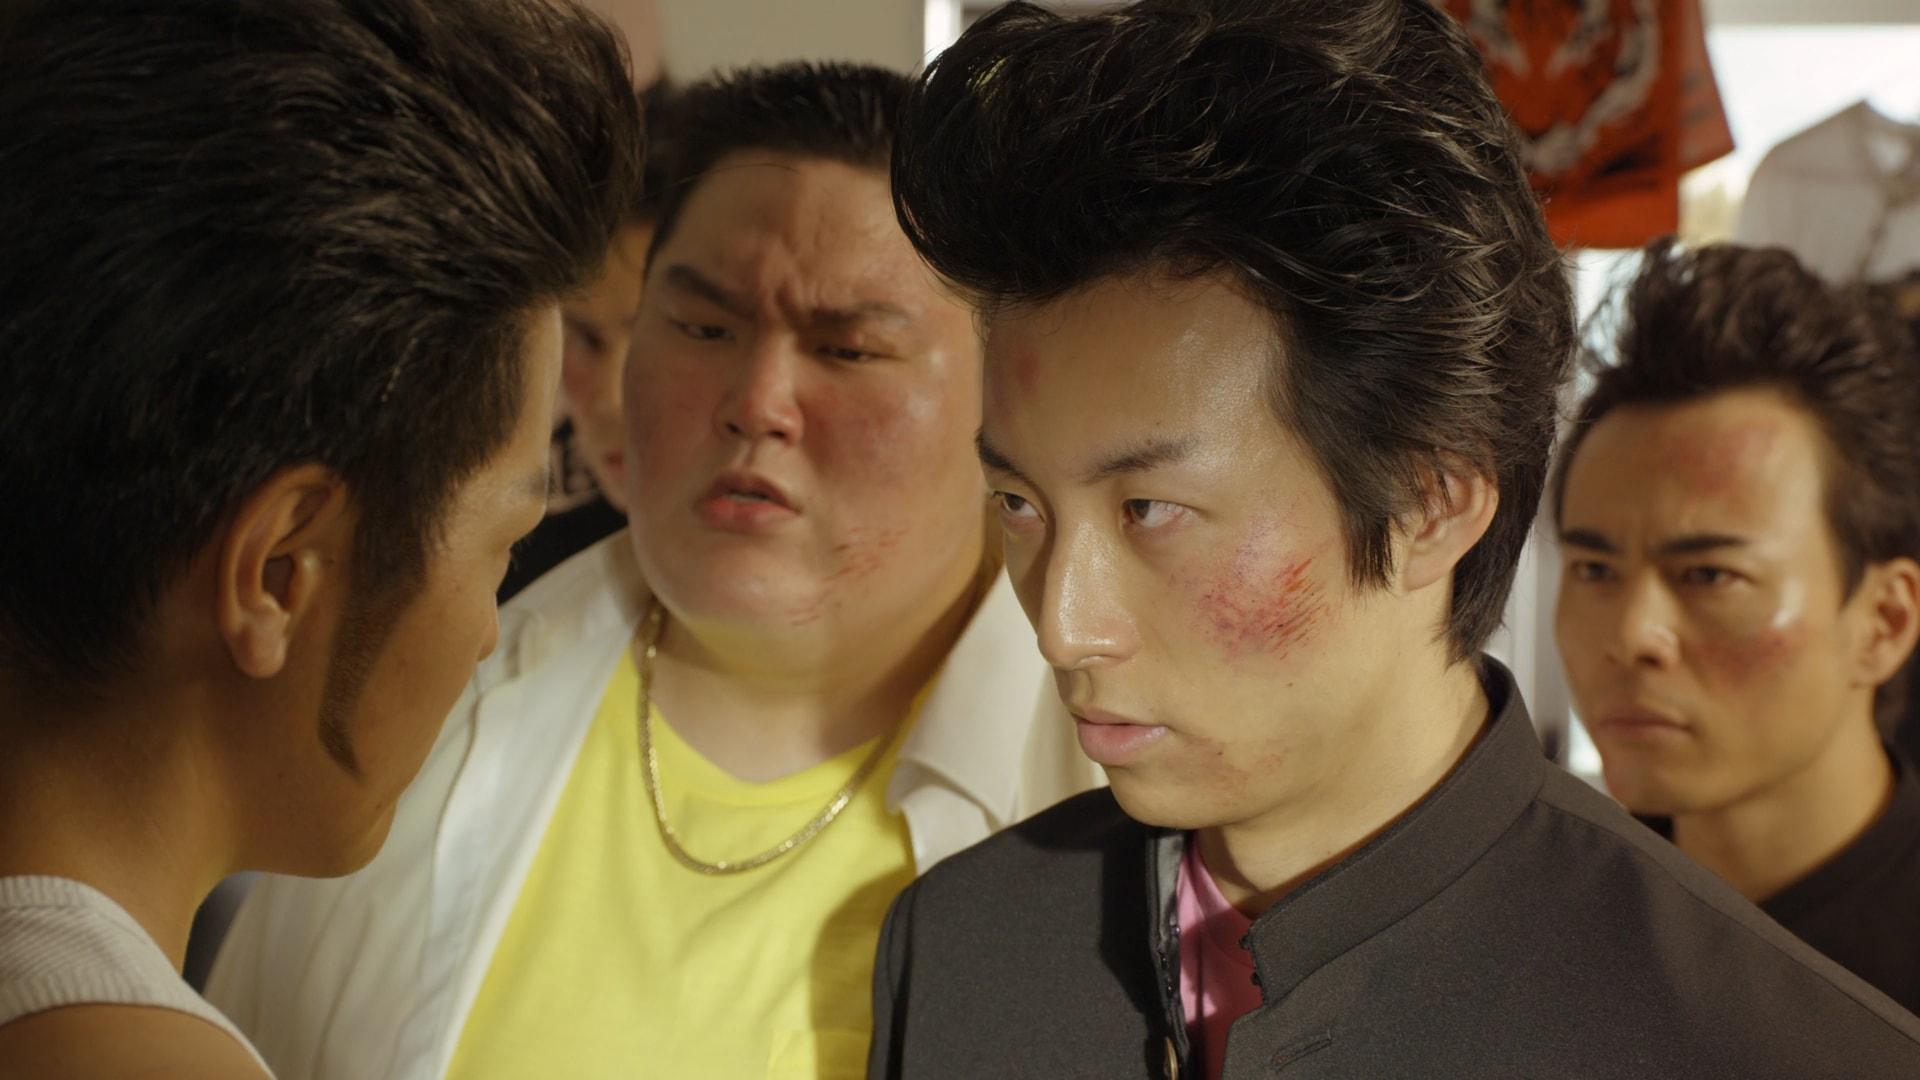 Mob Psycho 100 Drama Live Action # 4